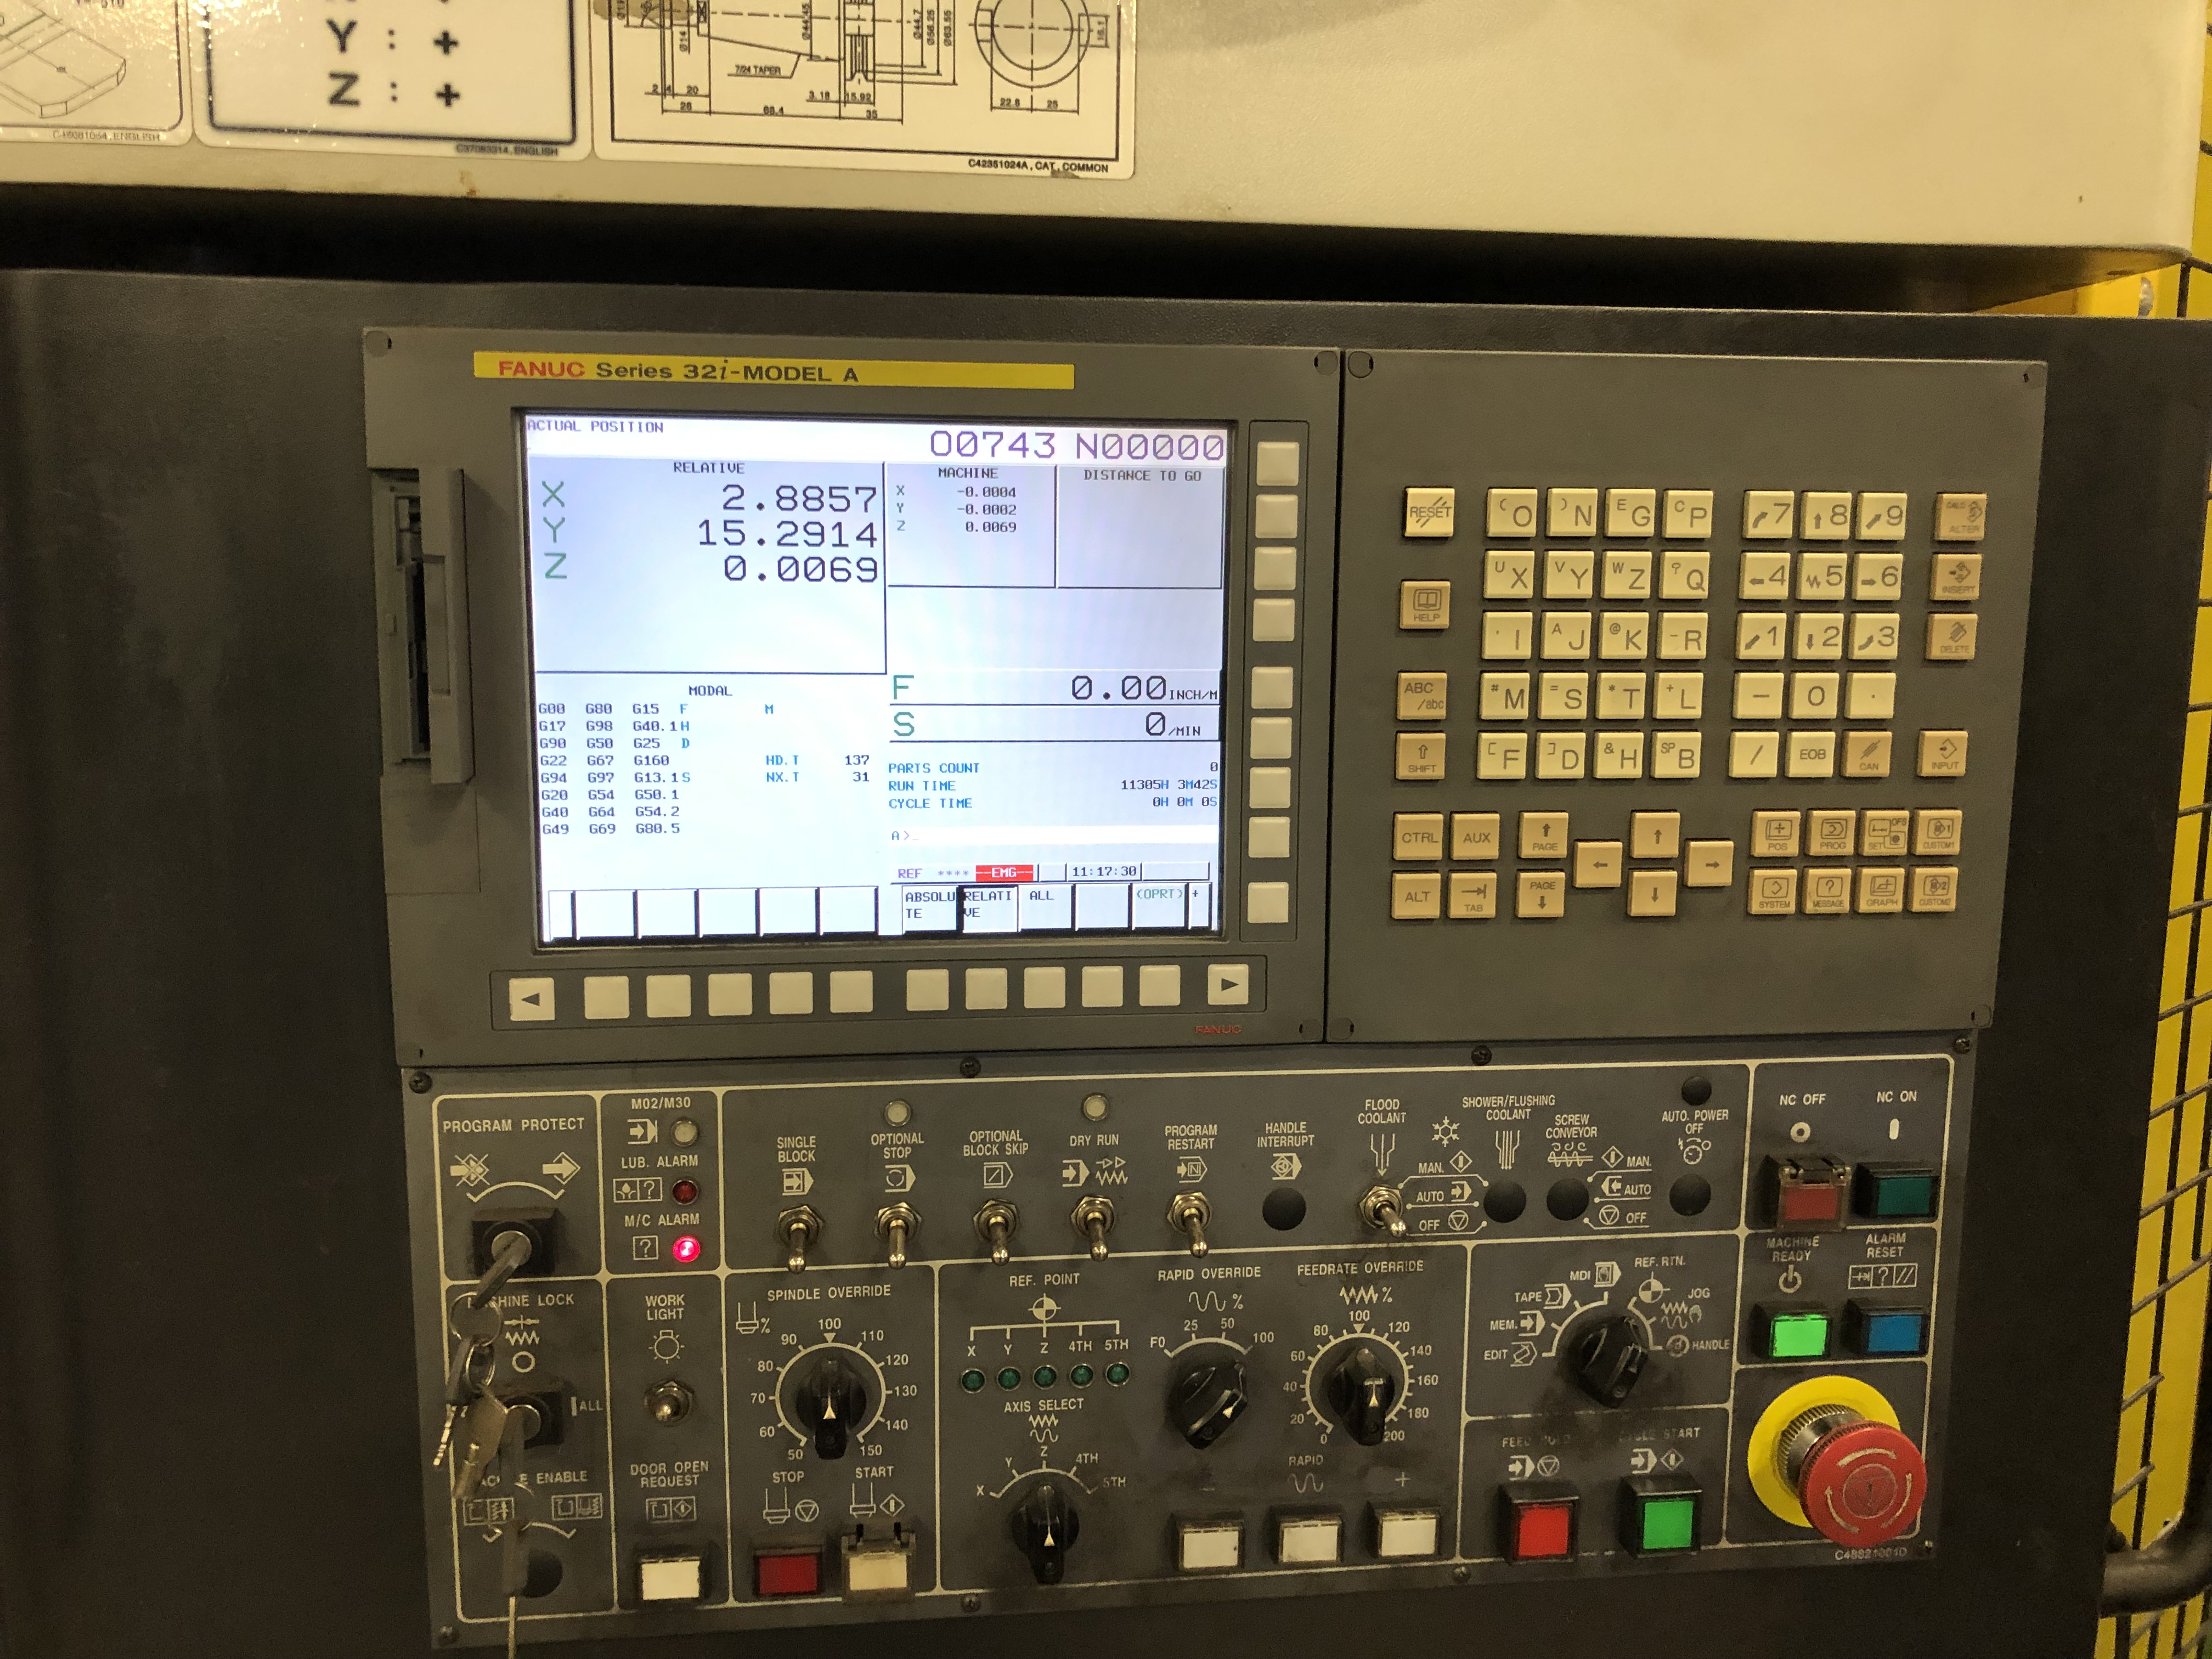 Doosan Model VC-500 VMC (2011), Fanuc 32iA, 20 HP, 10,000 RPM, 30 ATC, Chip Conv, 11,500 Approx Hrs - Image 7 of 8